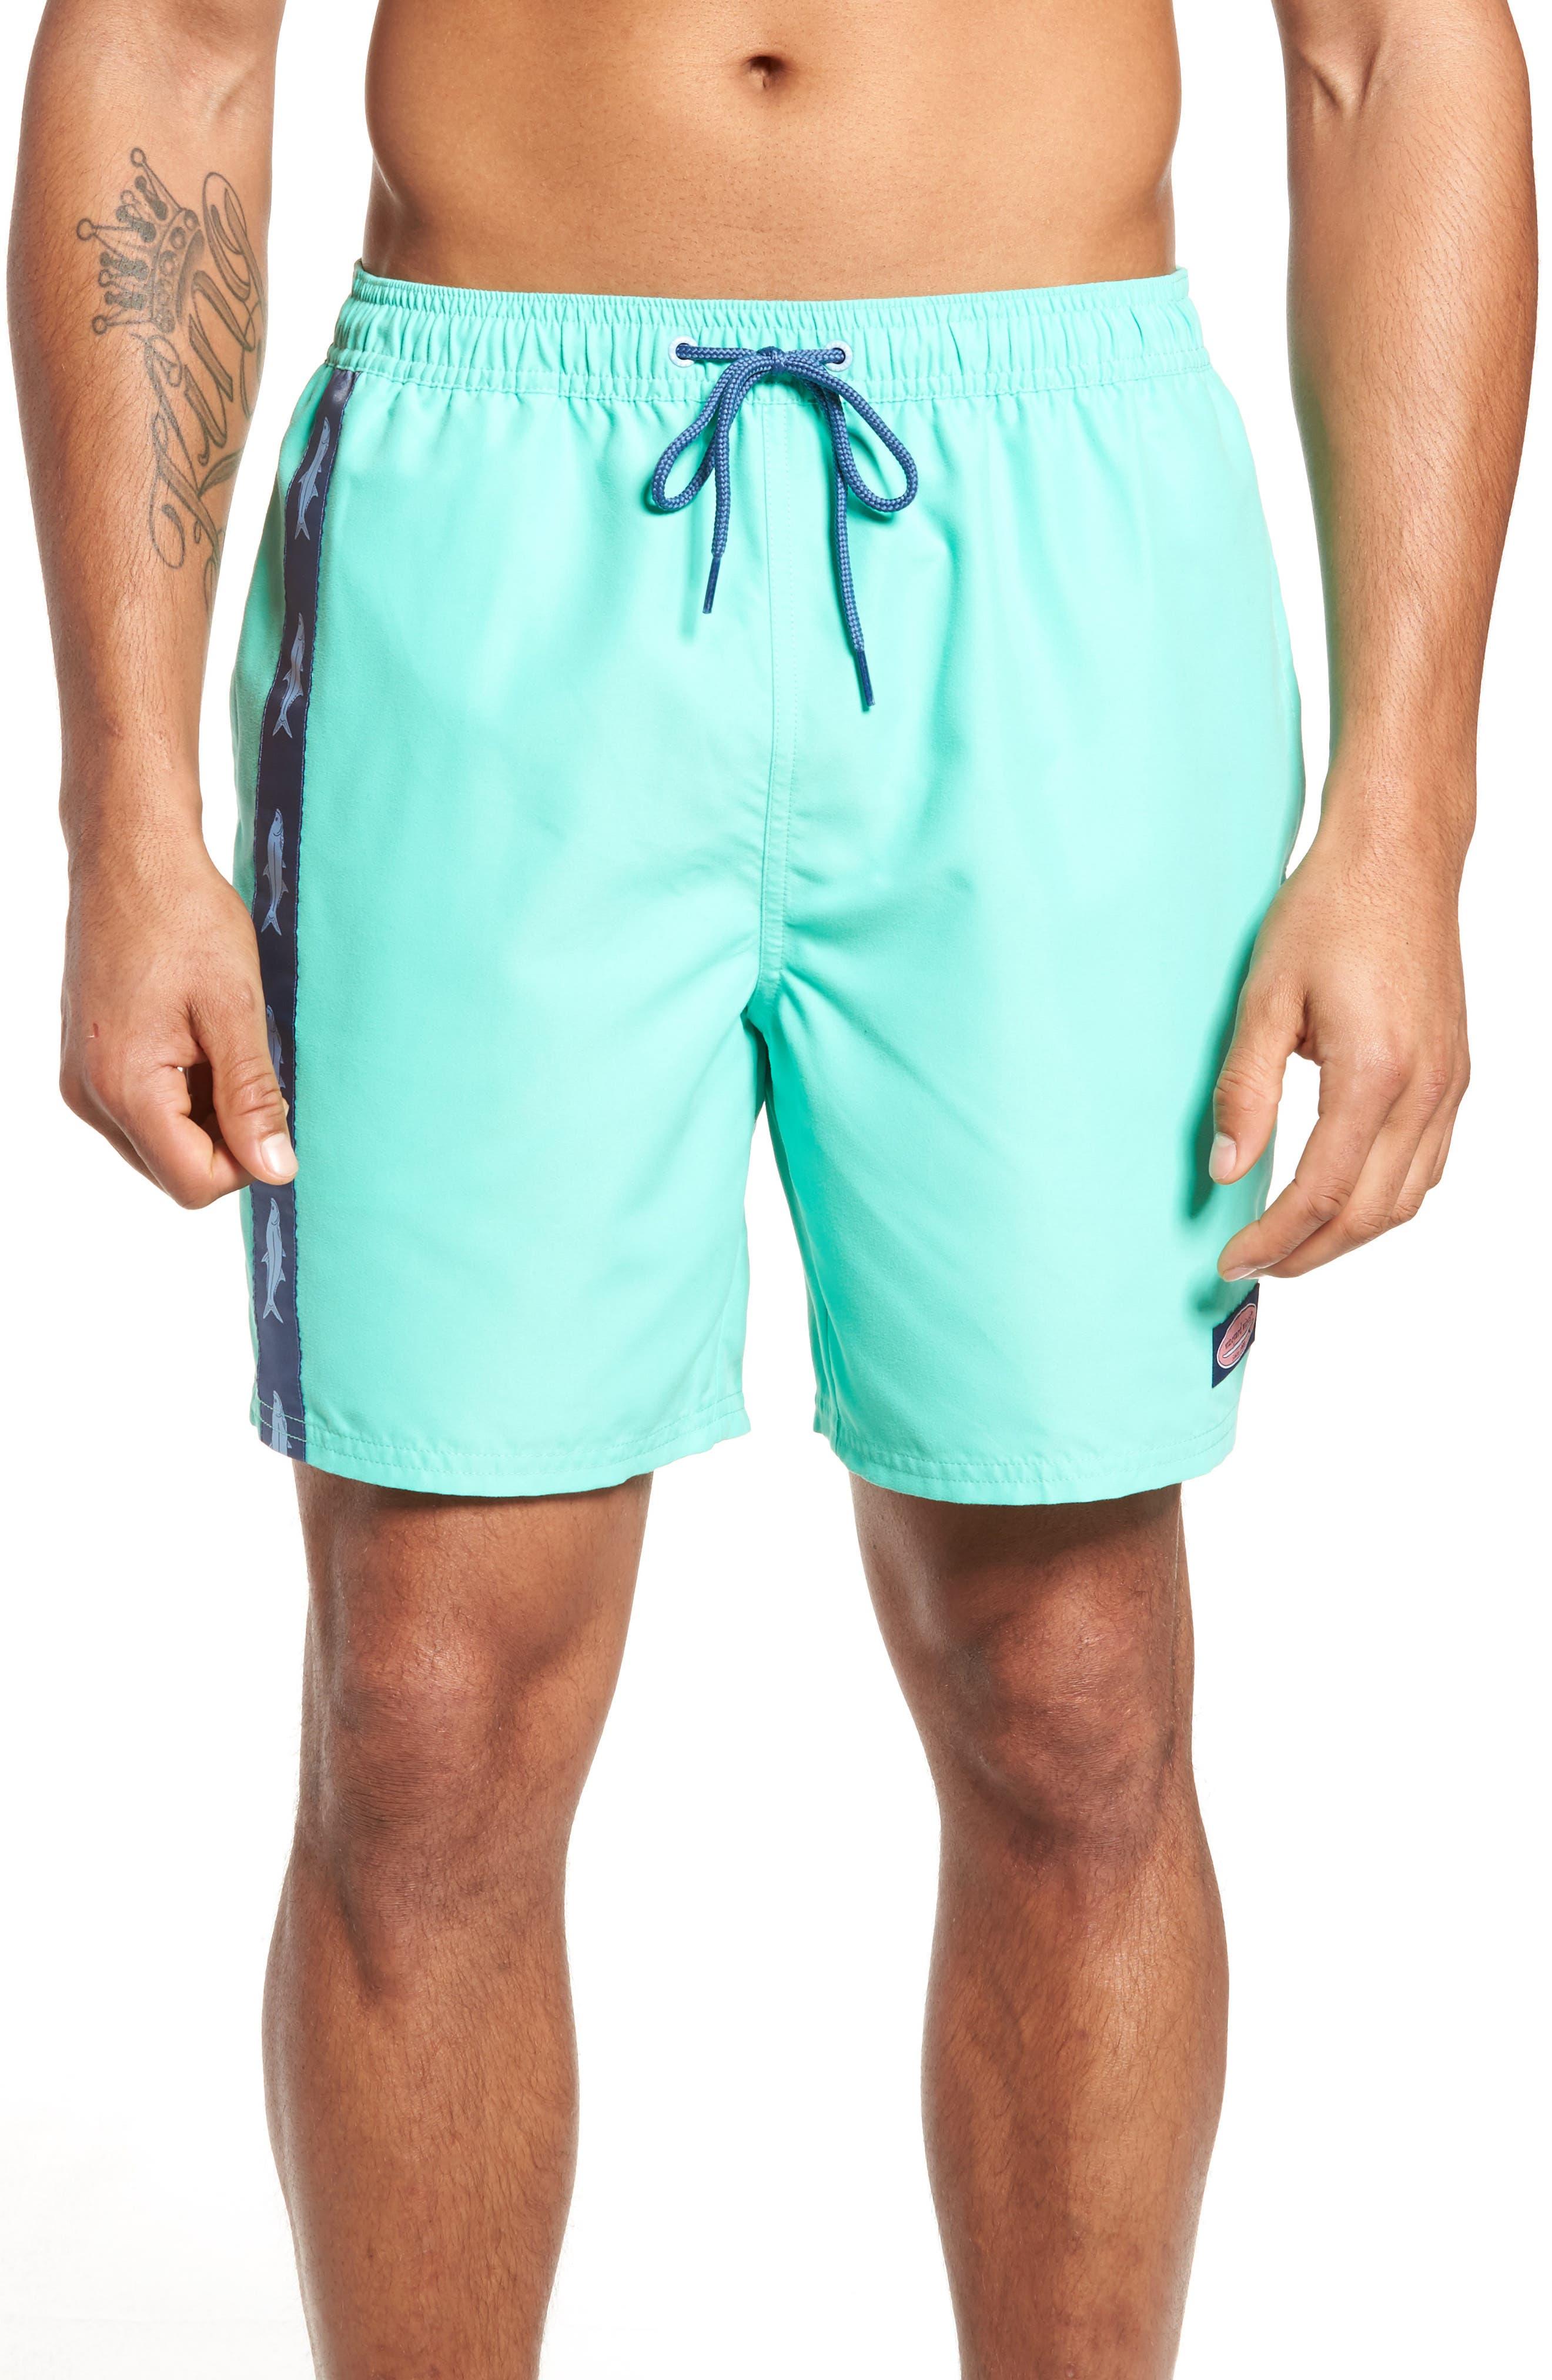 VINEYARD VINES Tarpon Taping Chappy Swim Trunks, Main, color, 359